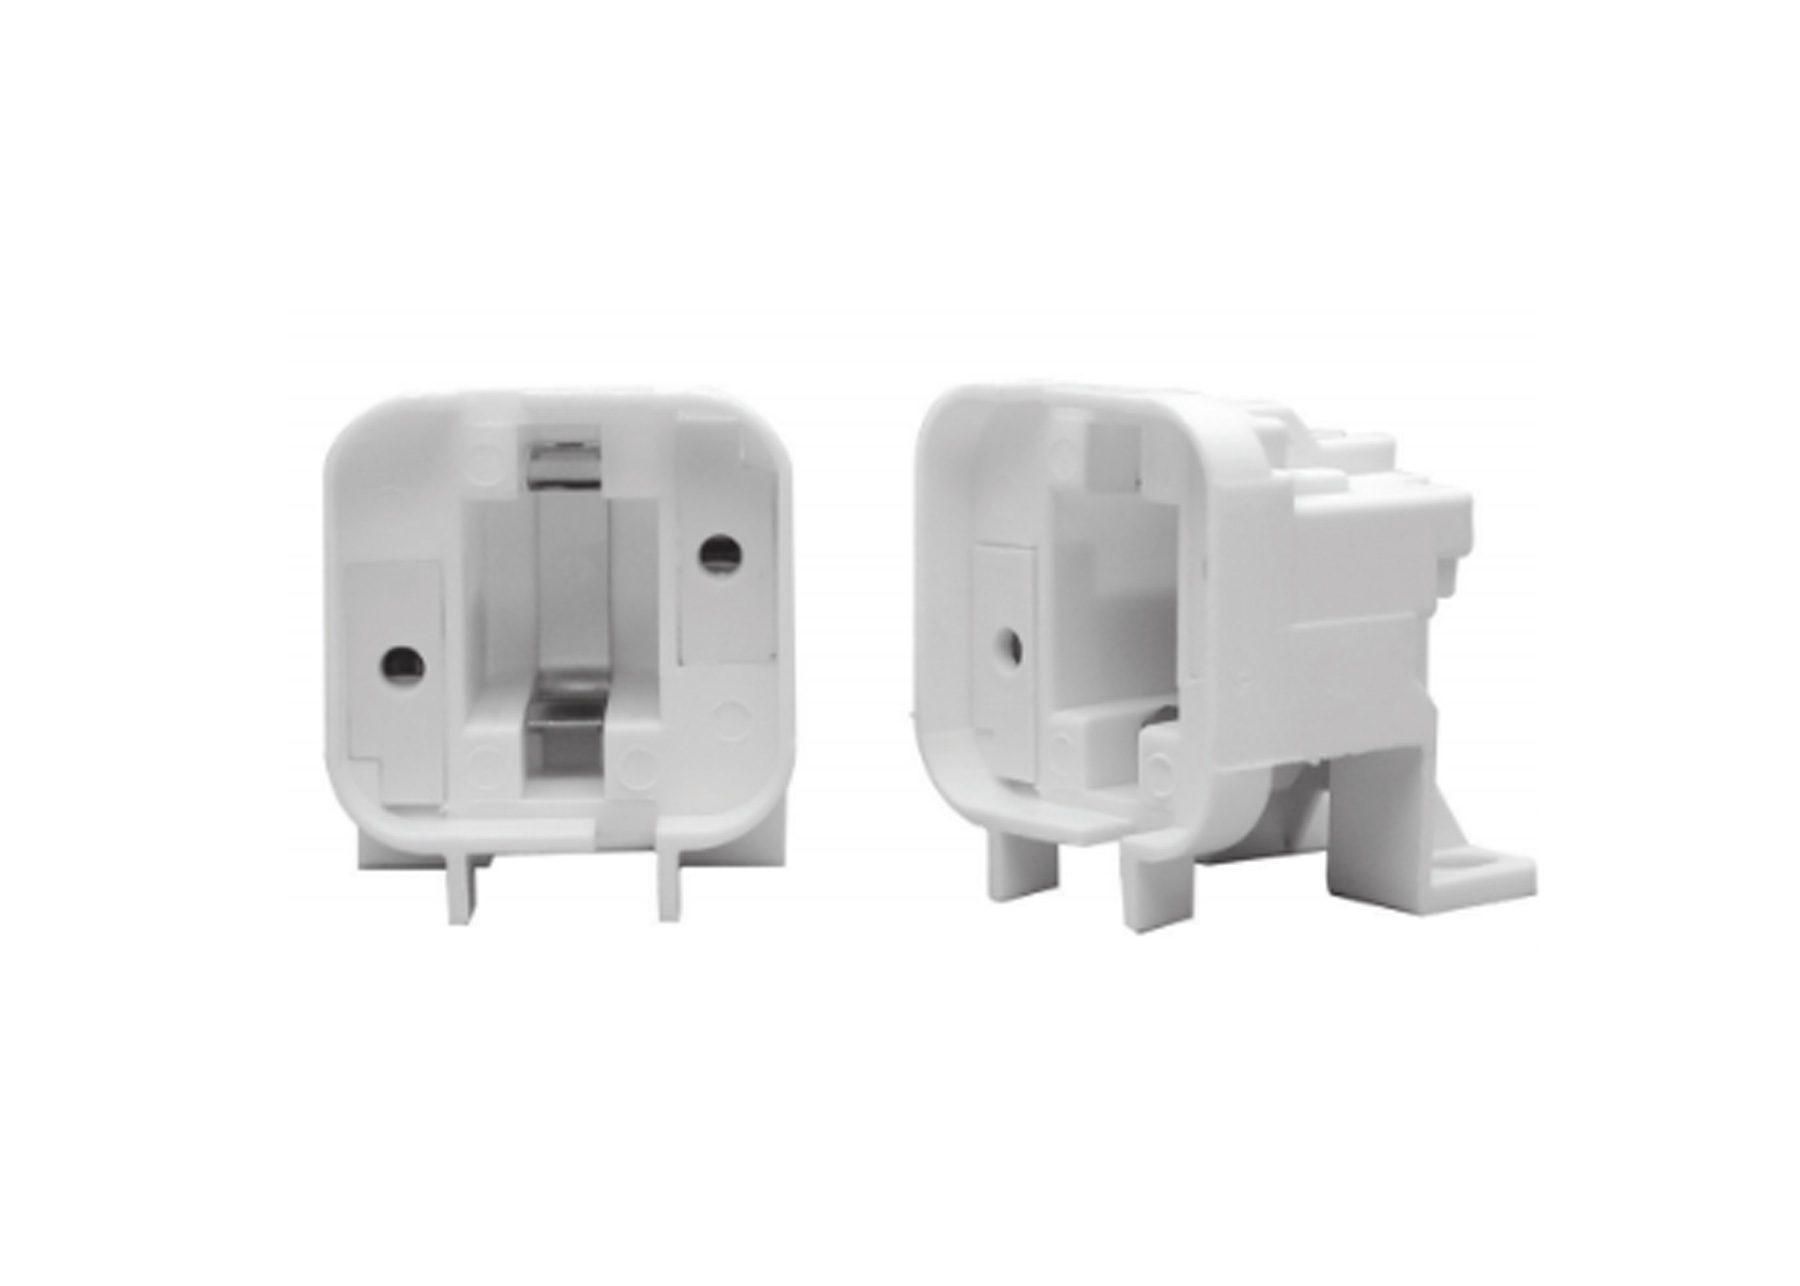 GX24-D1 CFL Light Socket